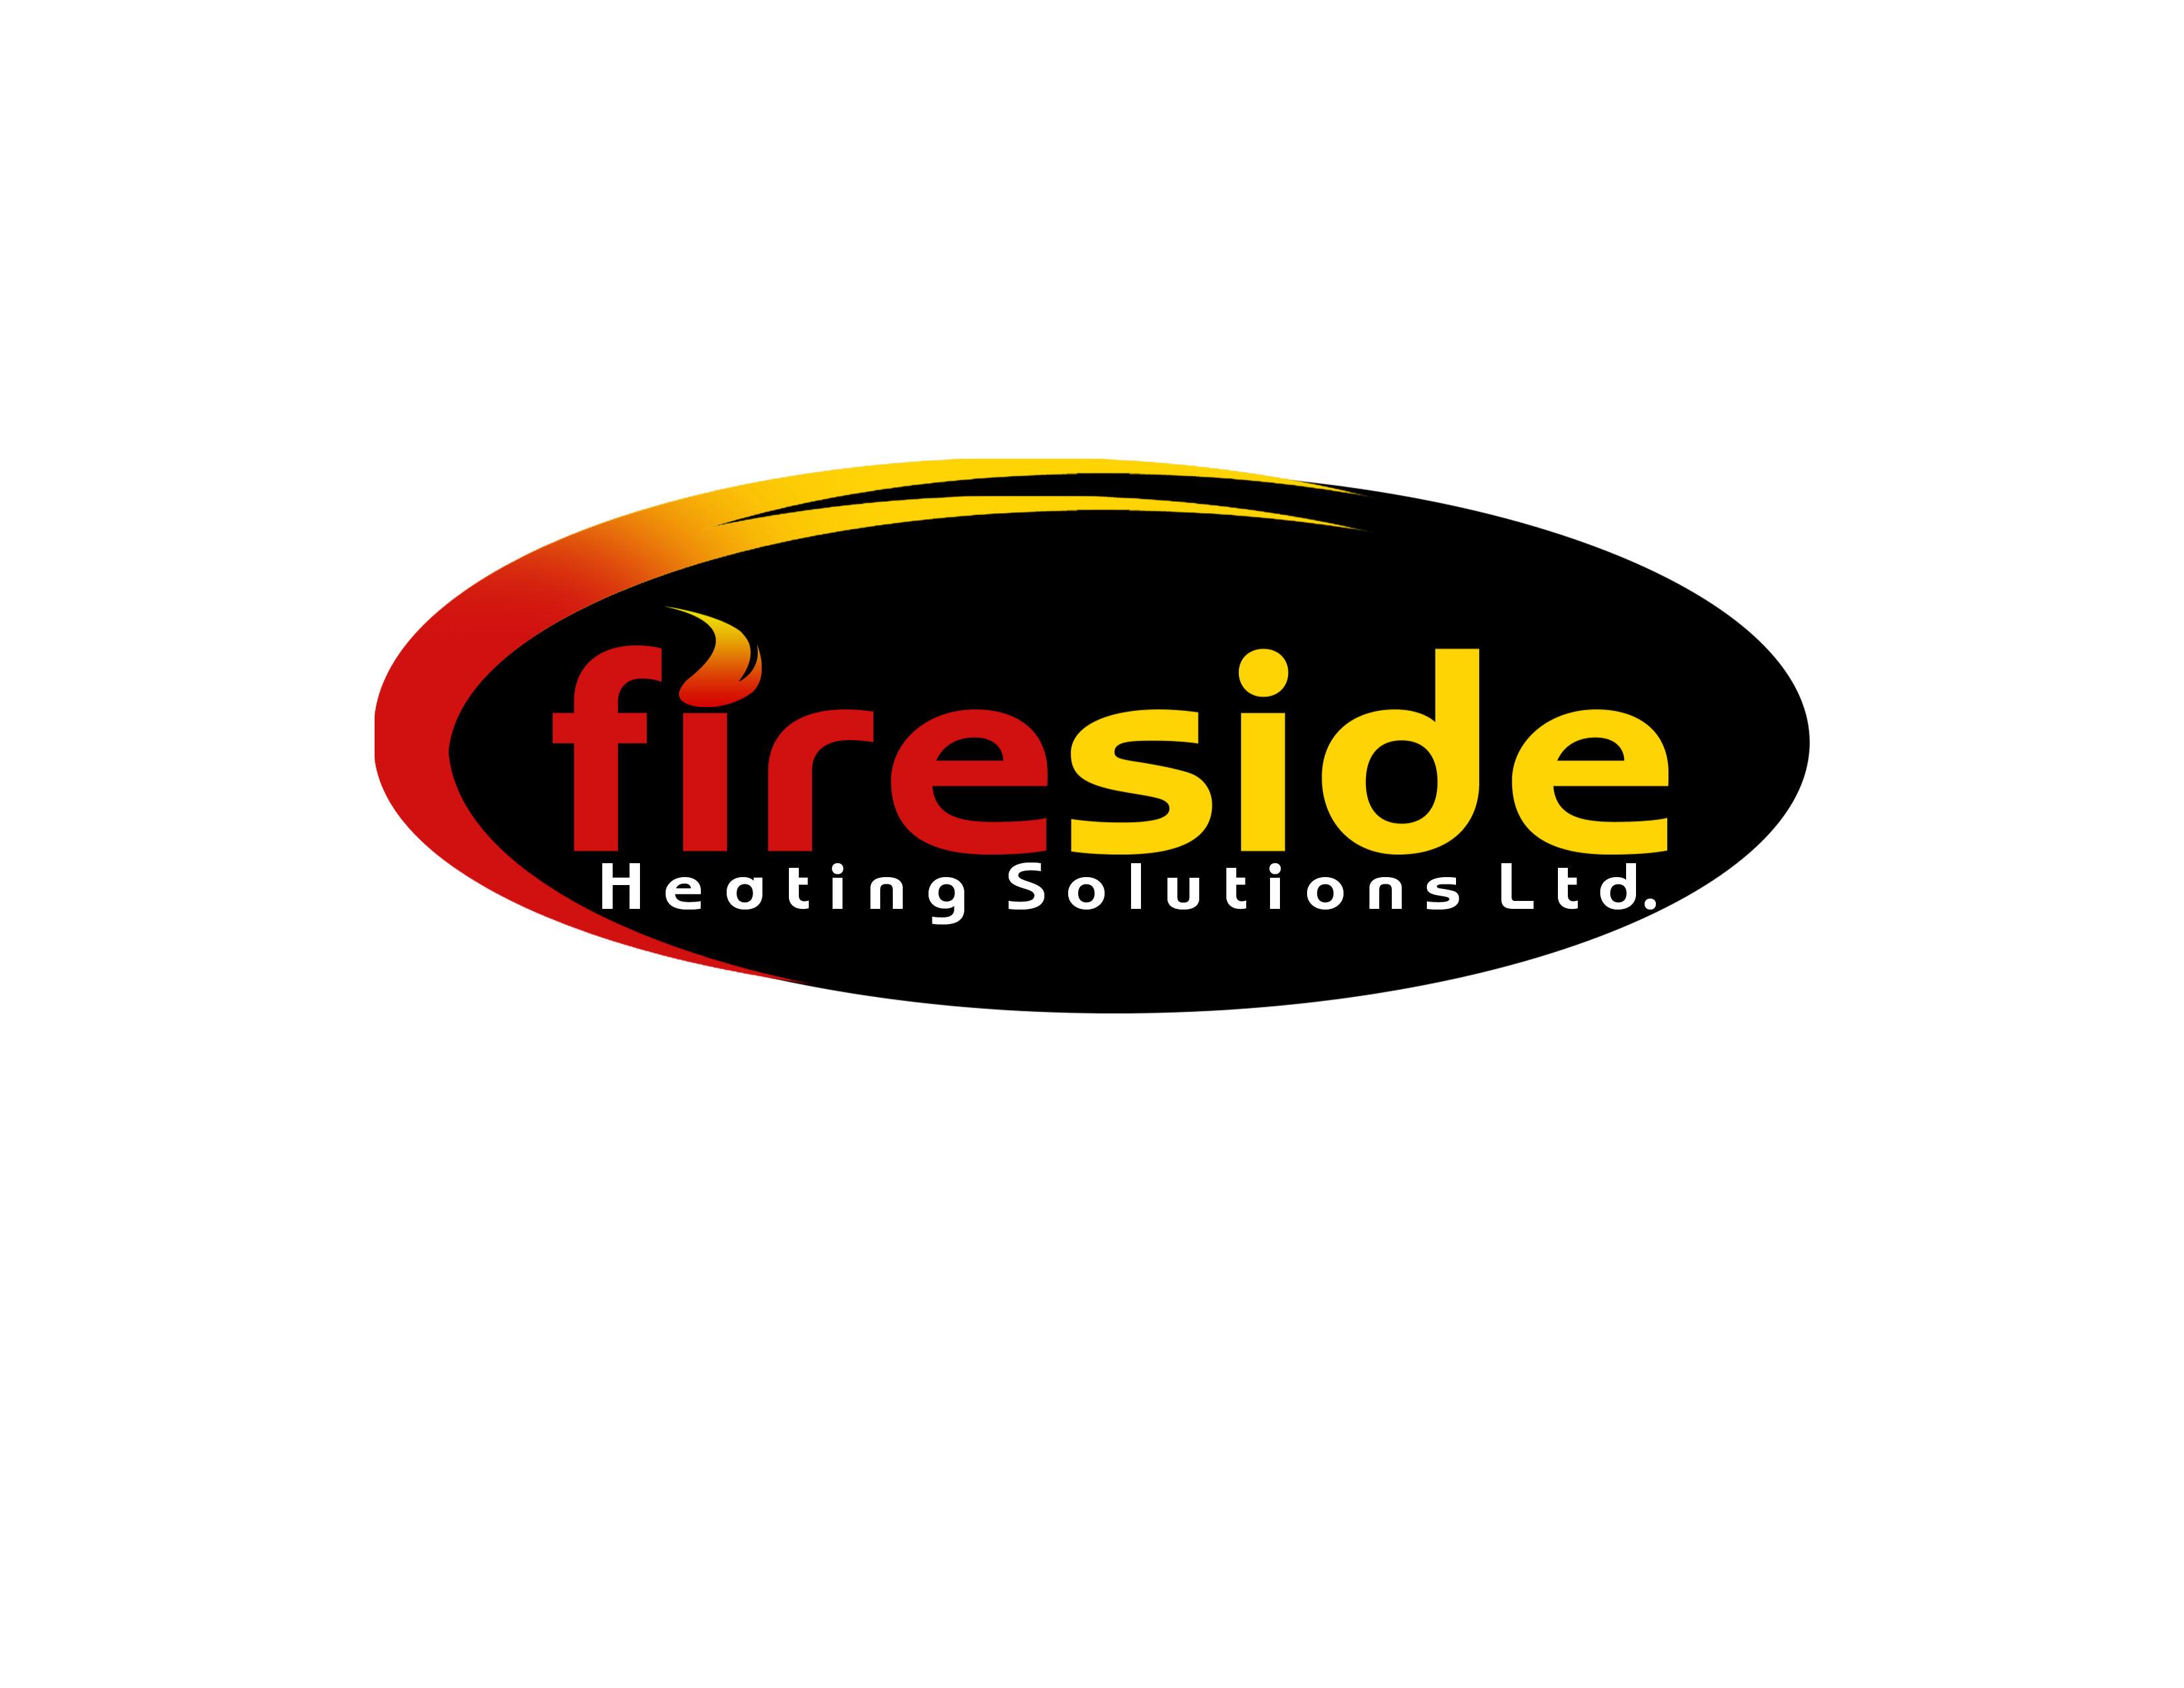 Logo Design by Allan Esclamado - Entry No. 179 in the Logo Design Contest Creative Logo Design for Fireside Heating Solutions Ltd..